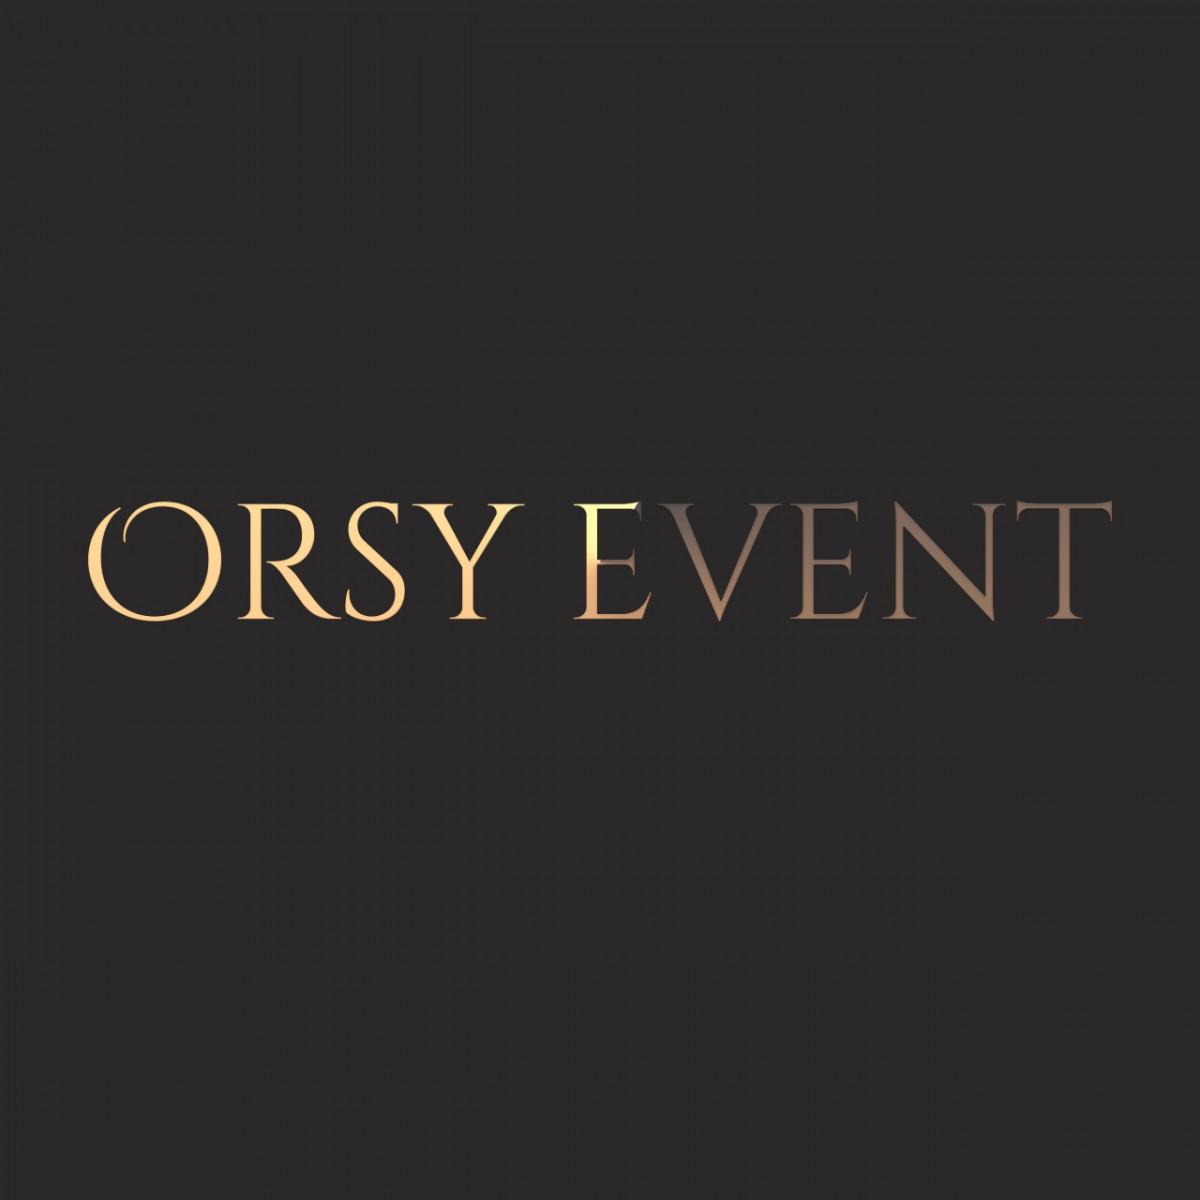 Orsy Event - Teleport Hub - teleporthub.com